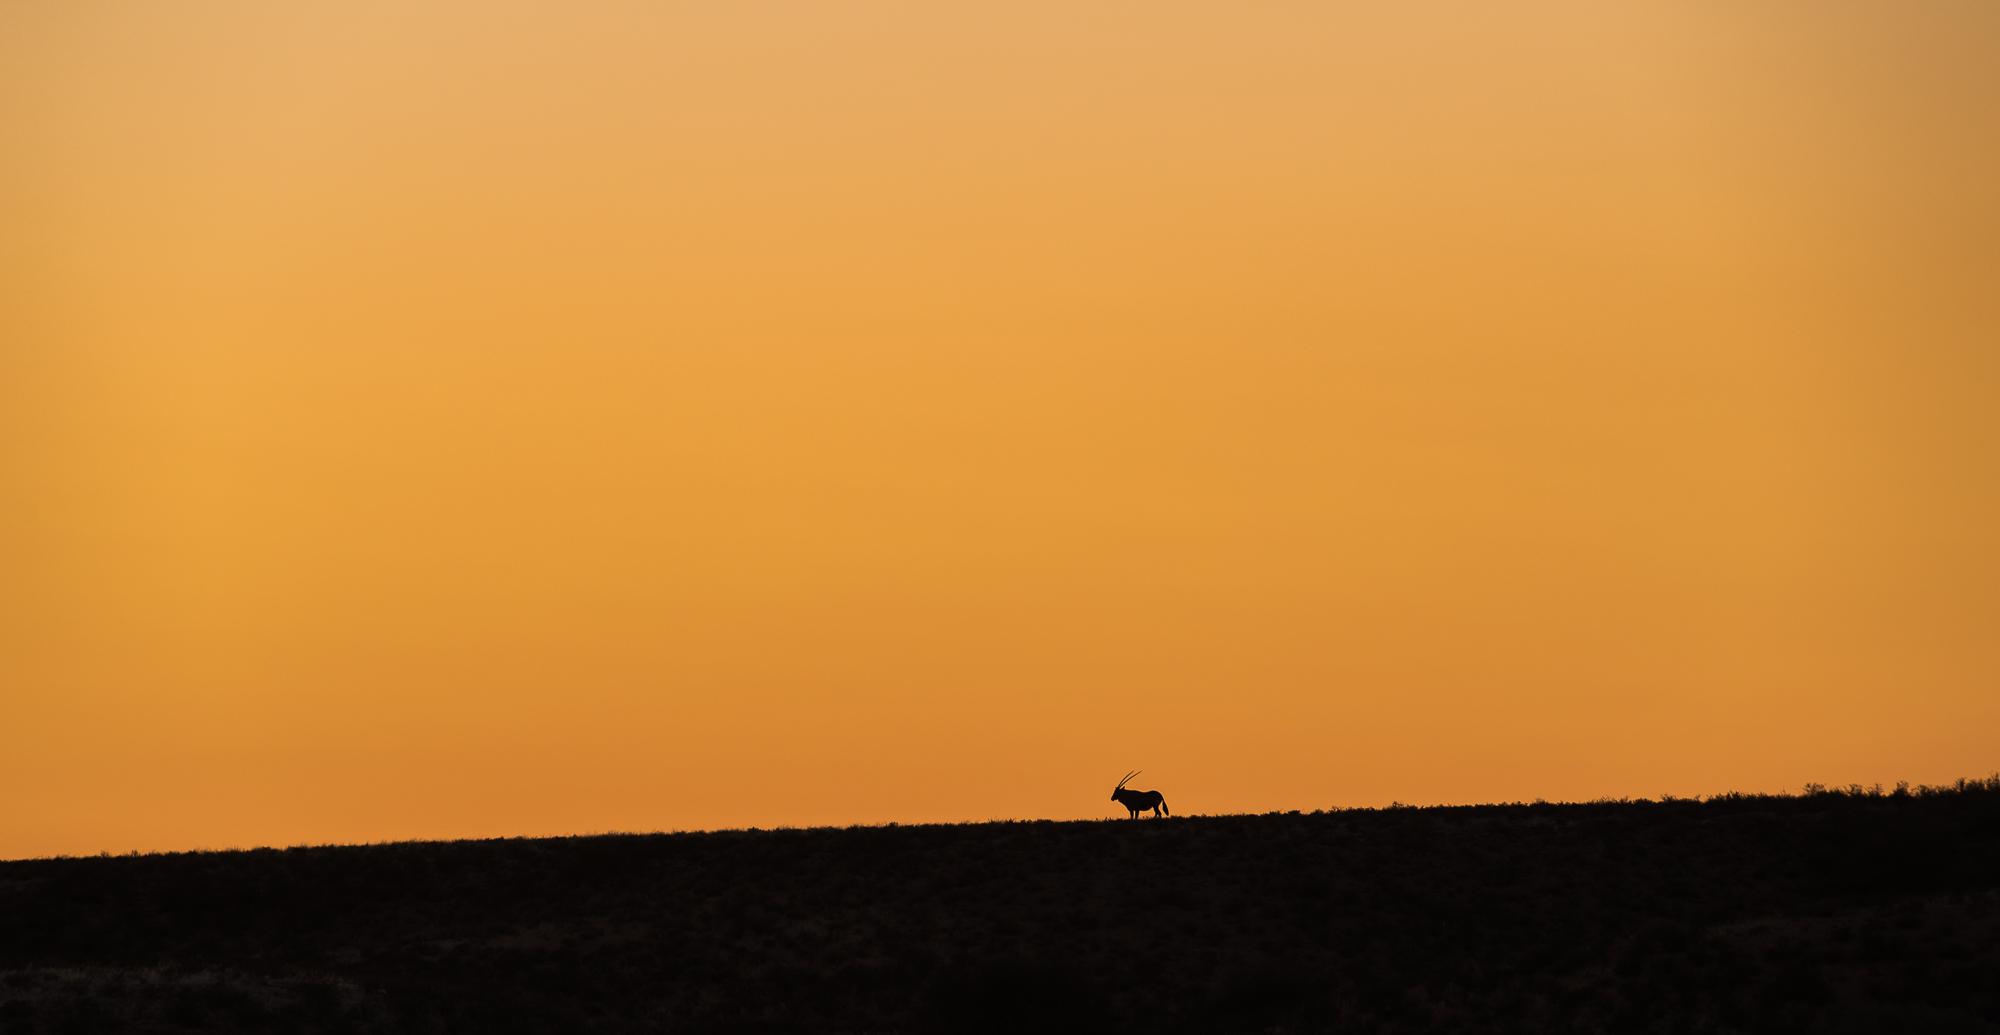 Gemsbok tijdens zonsopkomst in Kgalagadi